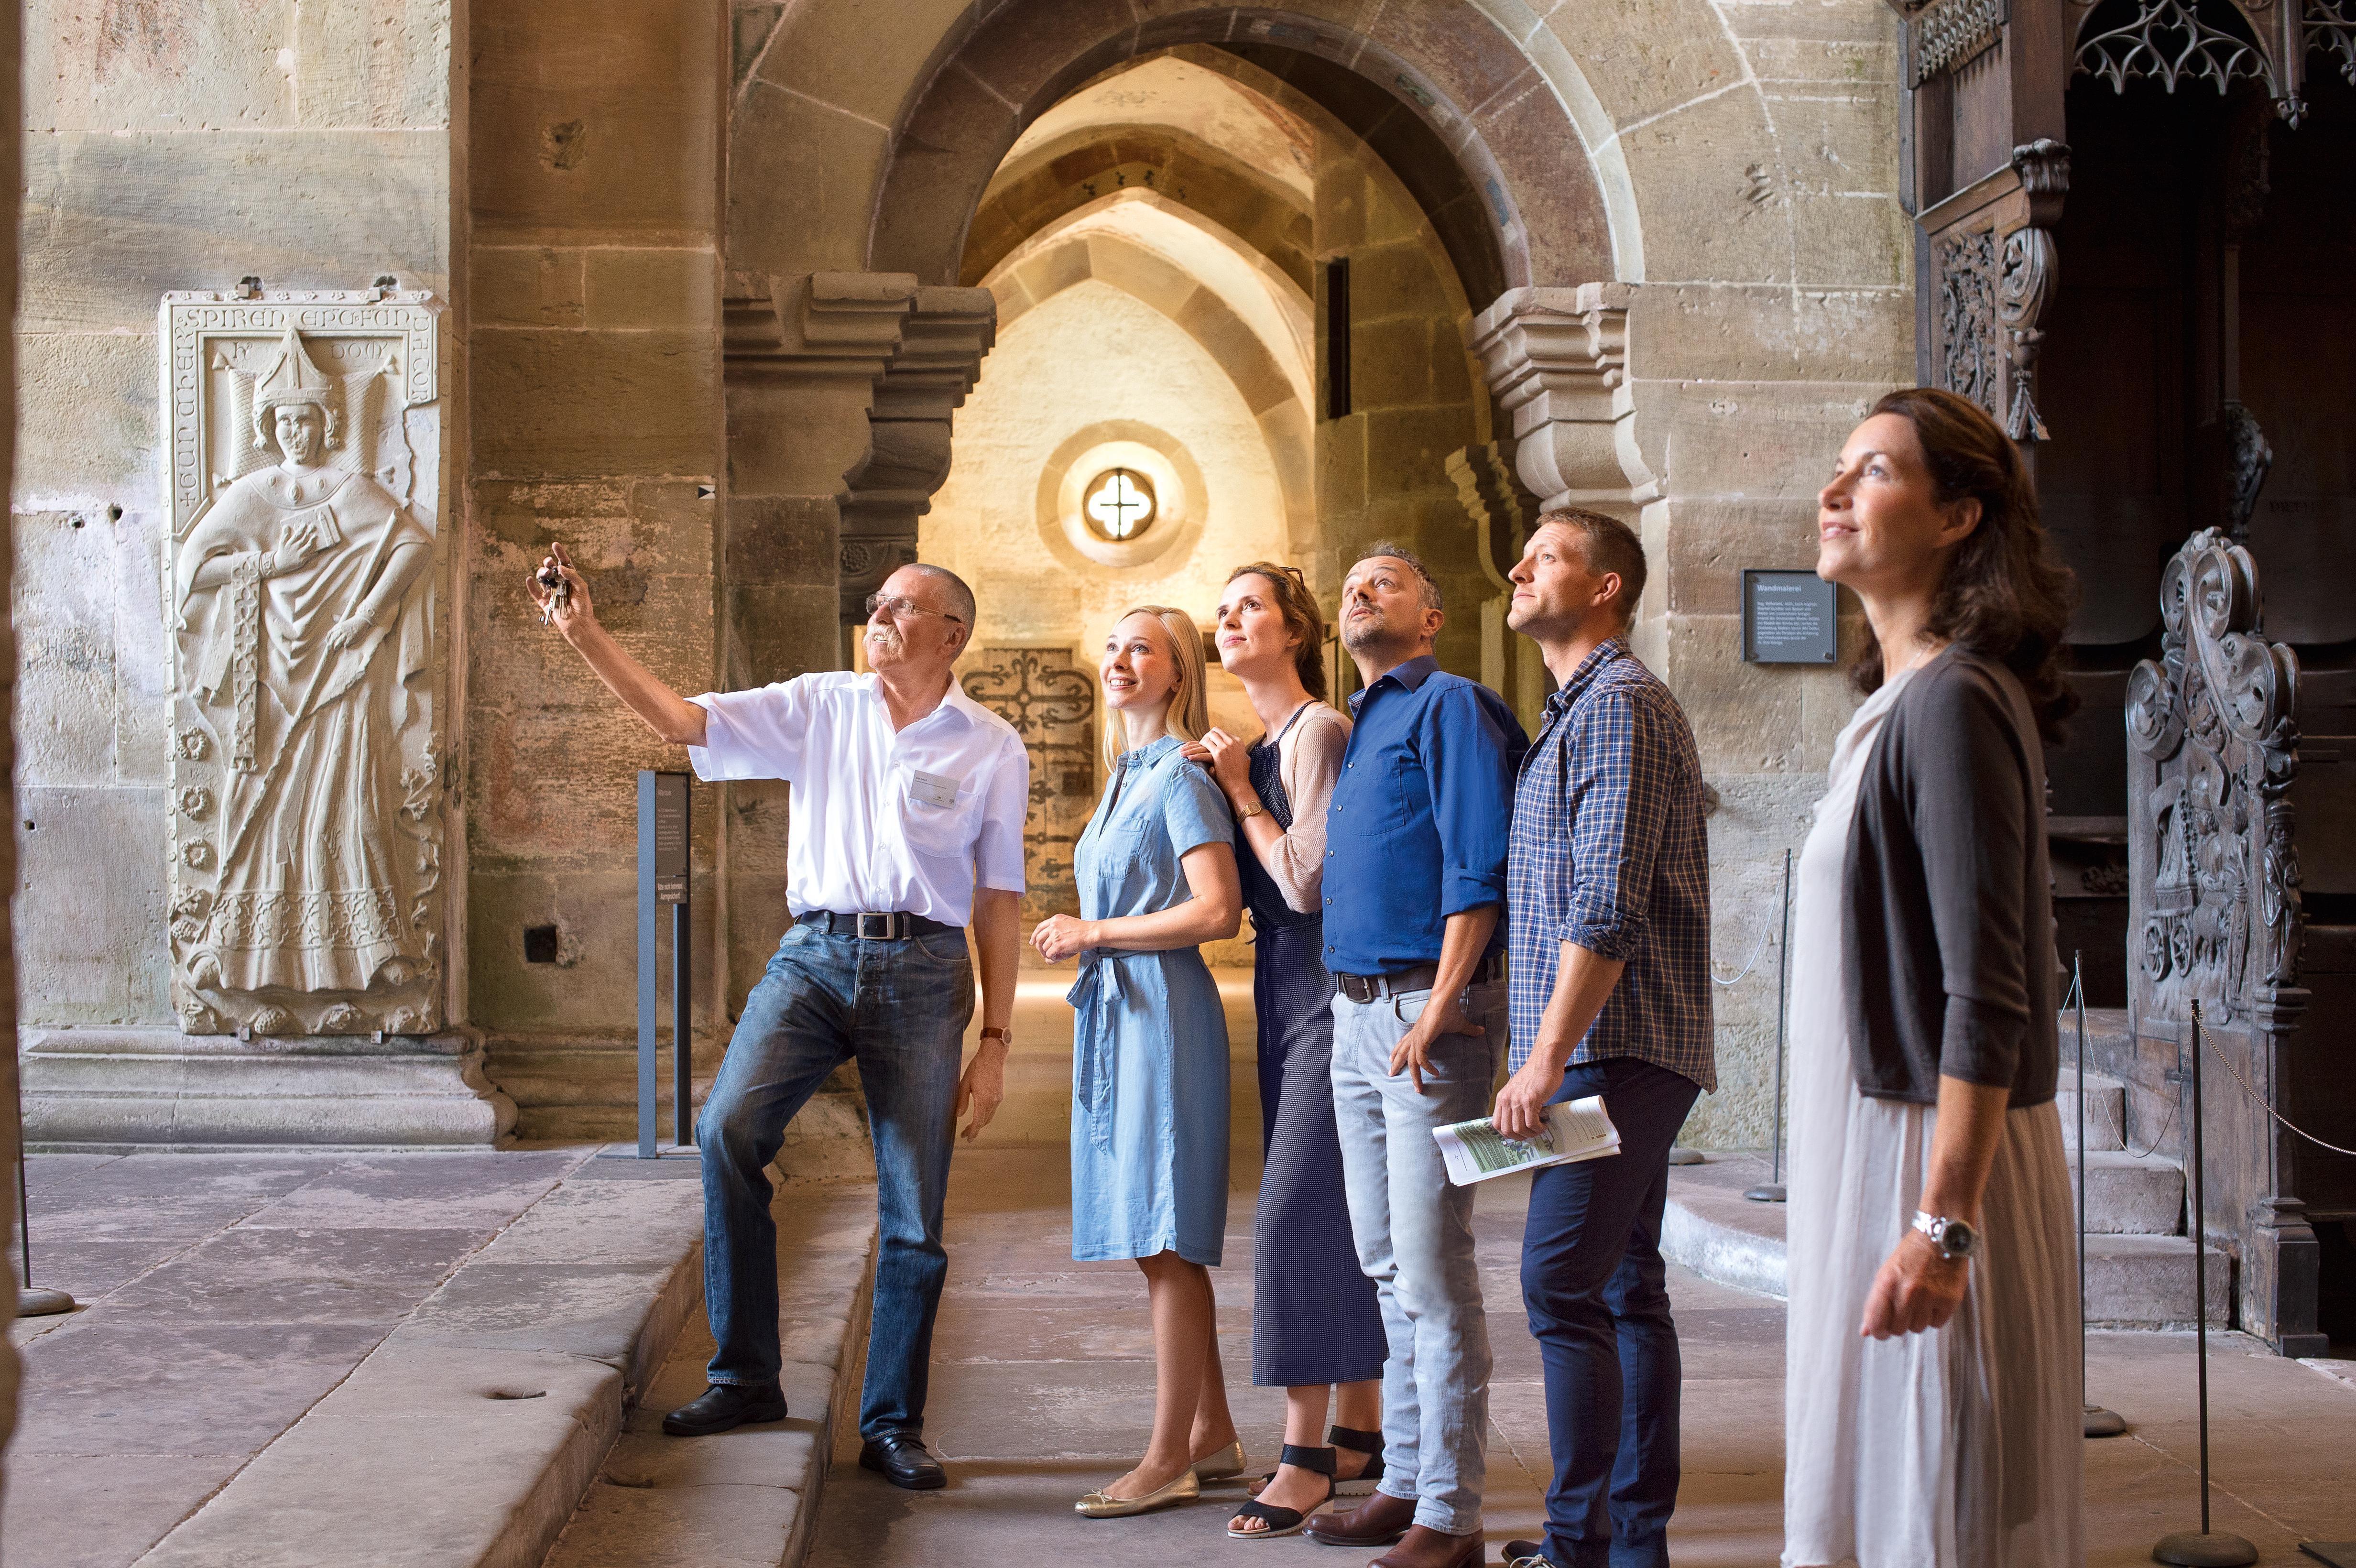 Besucher im Kloster Maulbronn